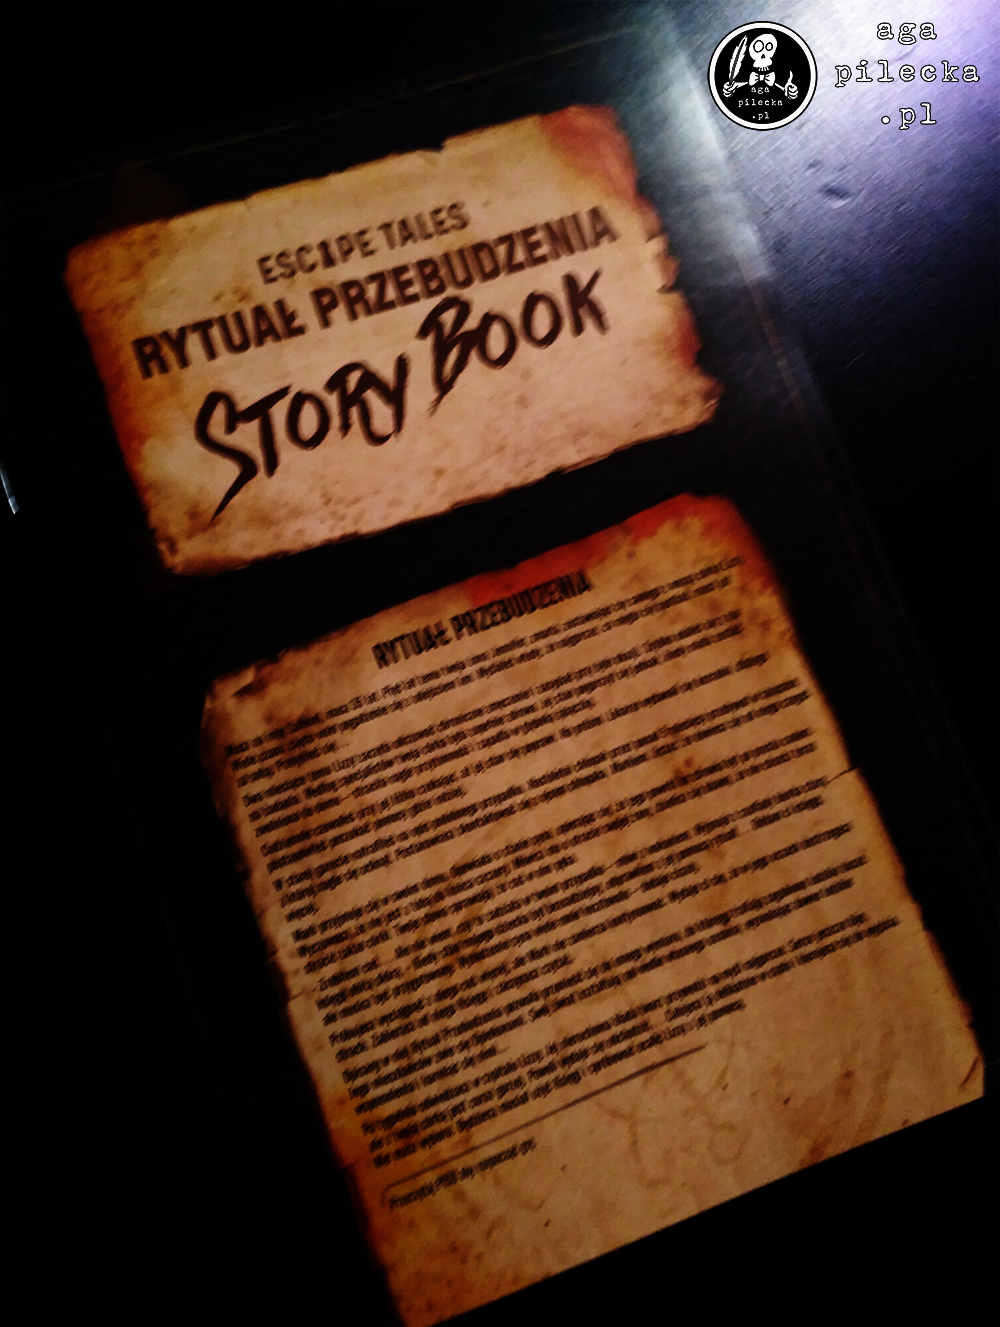 rytuał story book